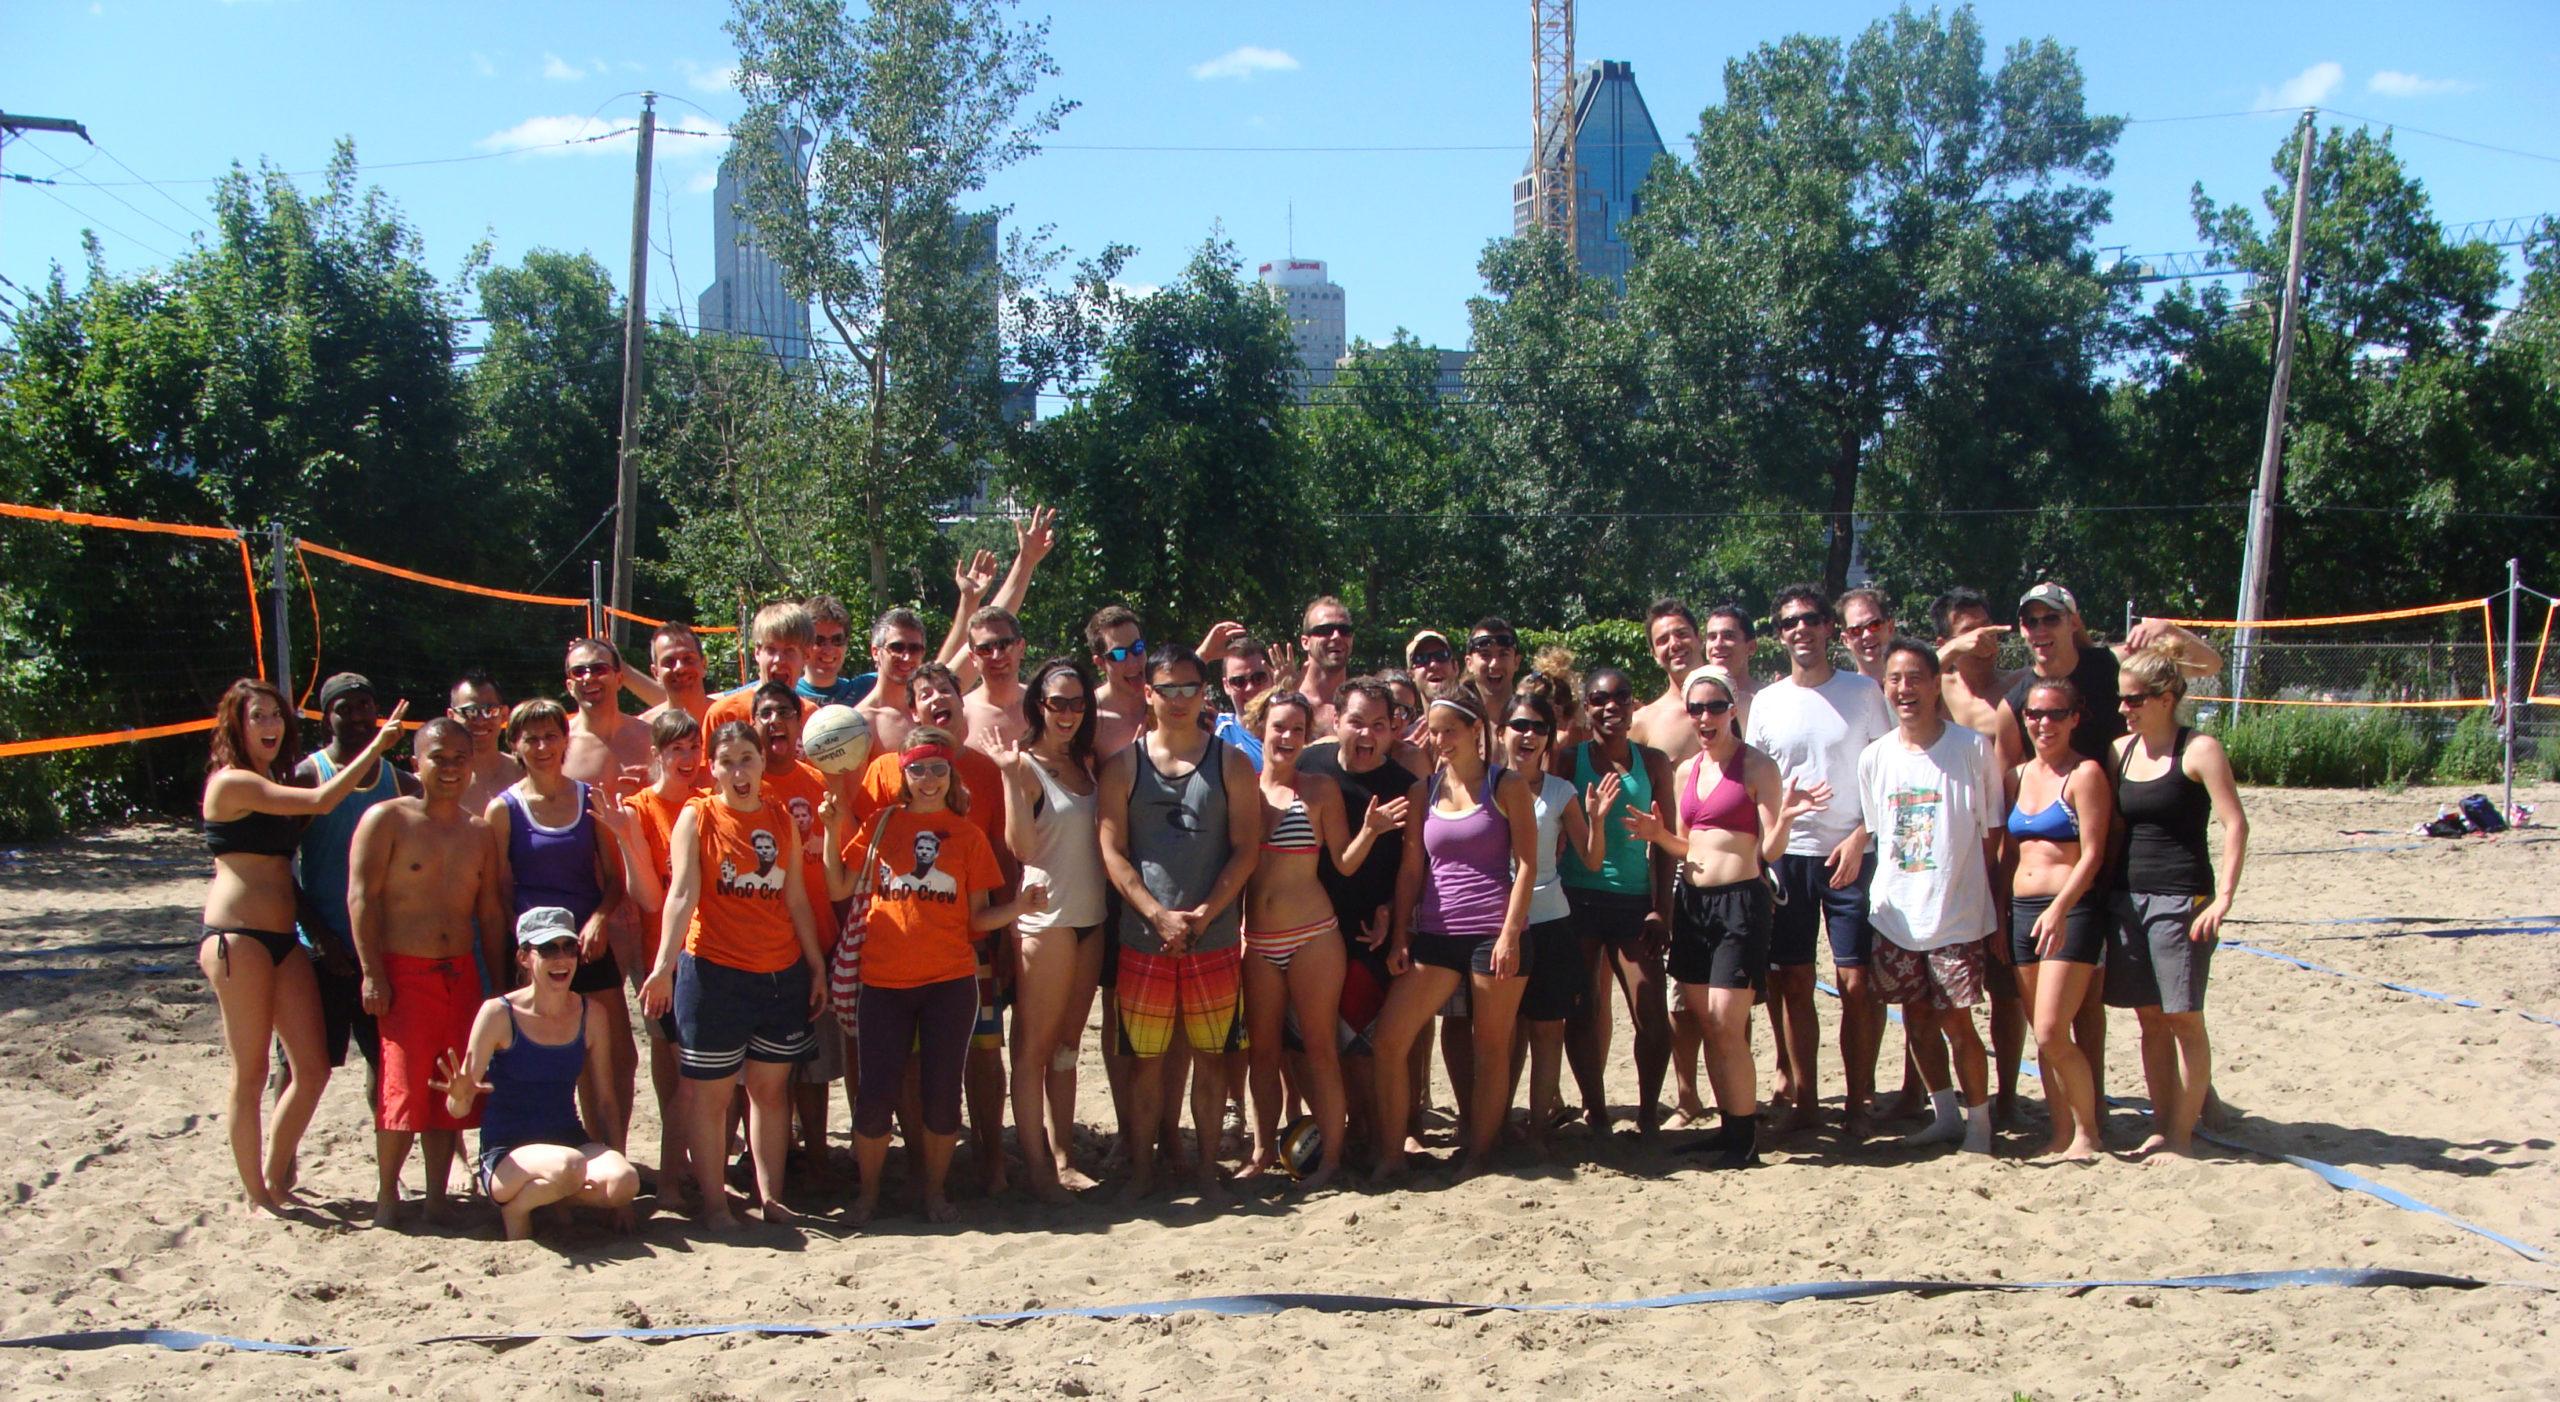 Beach_Volleyball_Group_crop